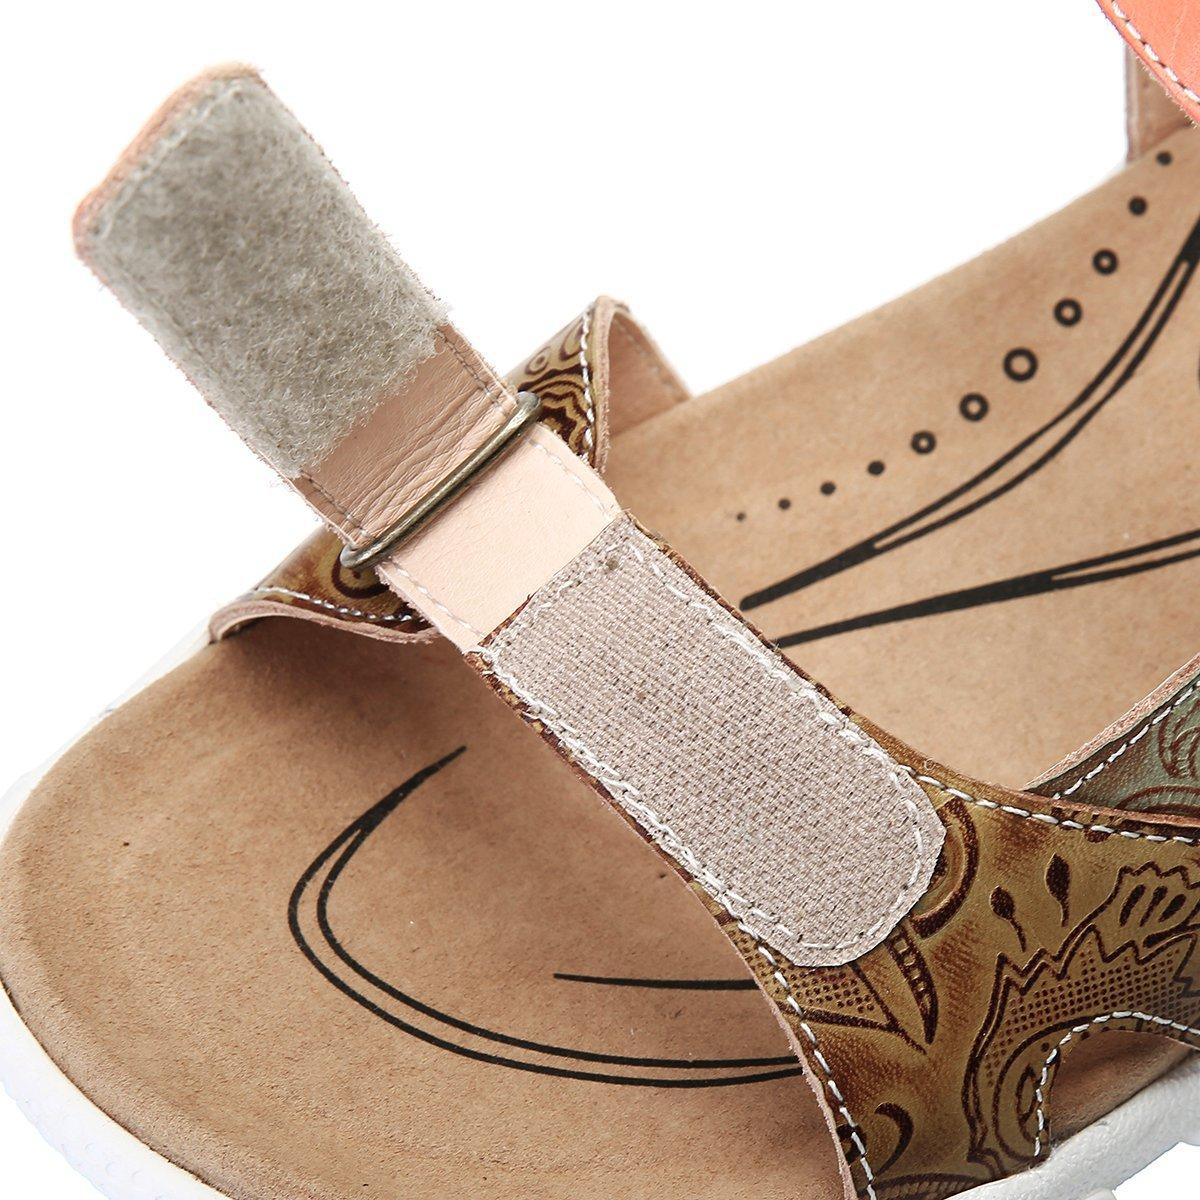 Calzado Gracosy Zapatos Deportivo Hook Sandalias Mujer Verano Planas wPkOn0